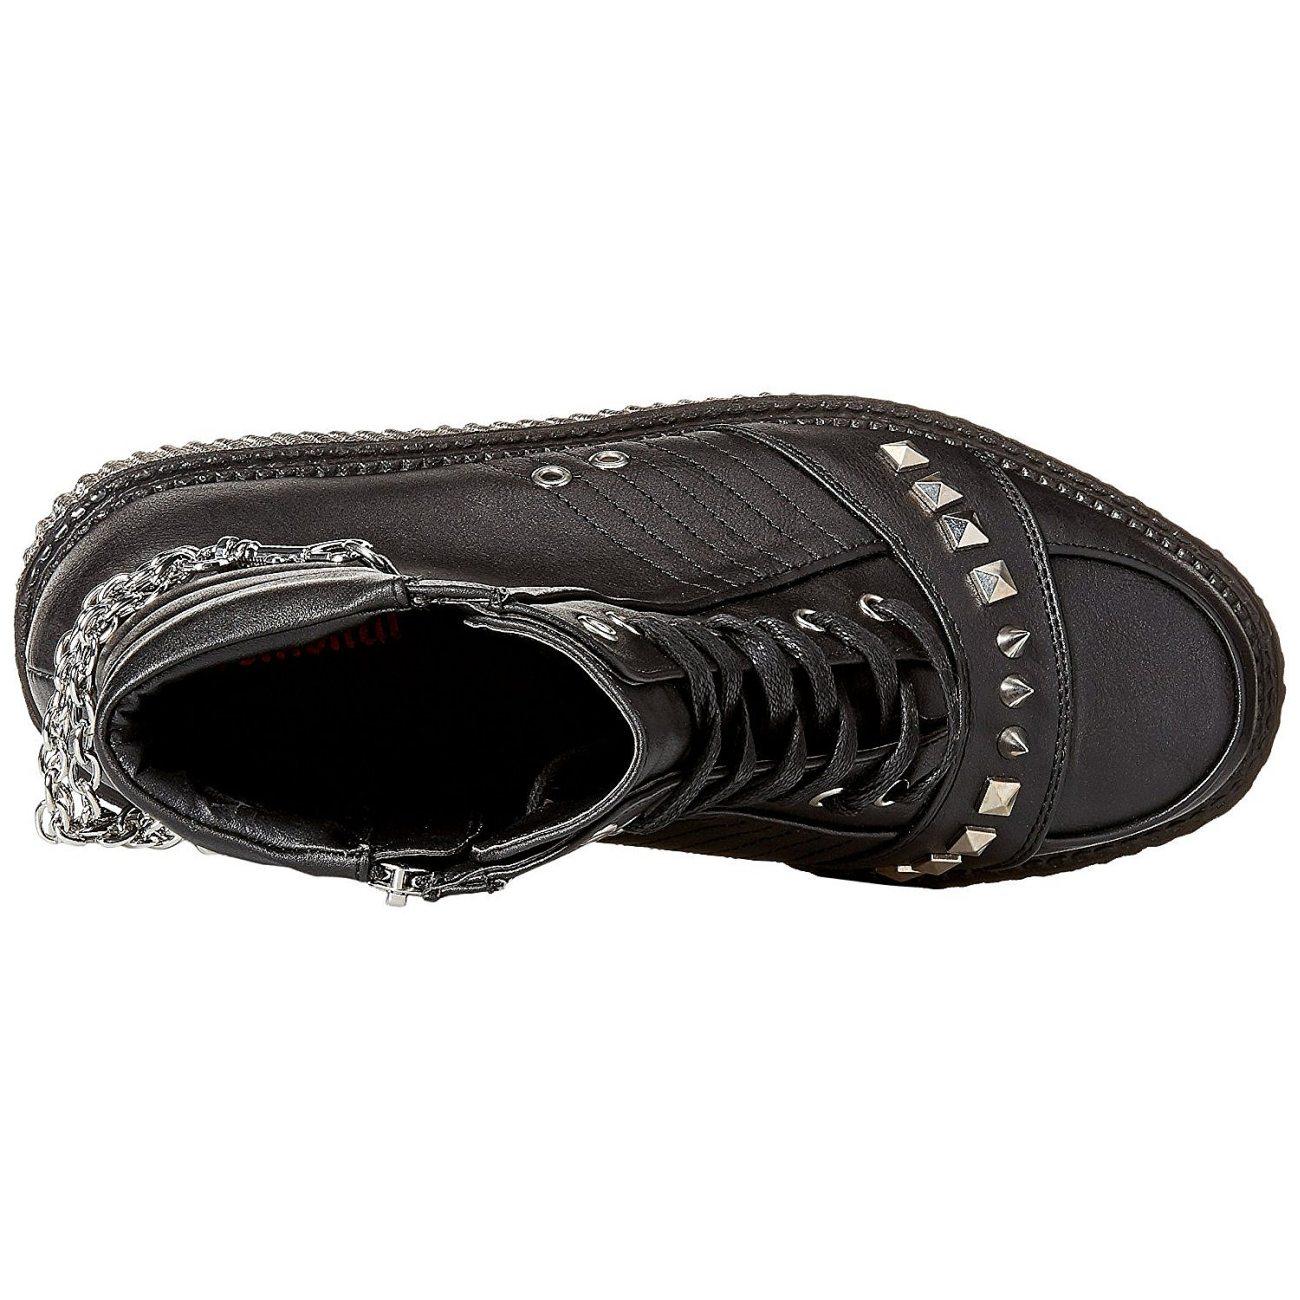 Blk Leather V creeper Vegan Demonia 565 xsdtQrBhC